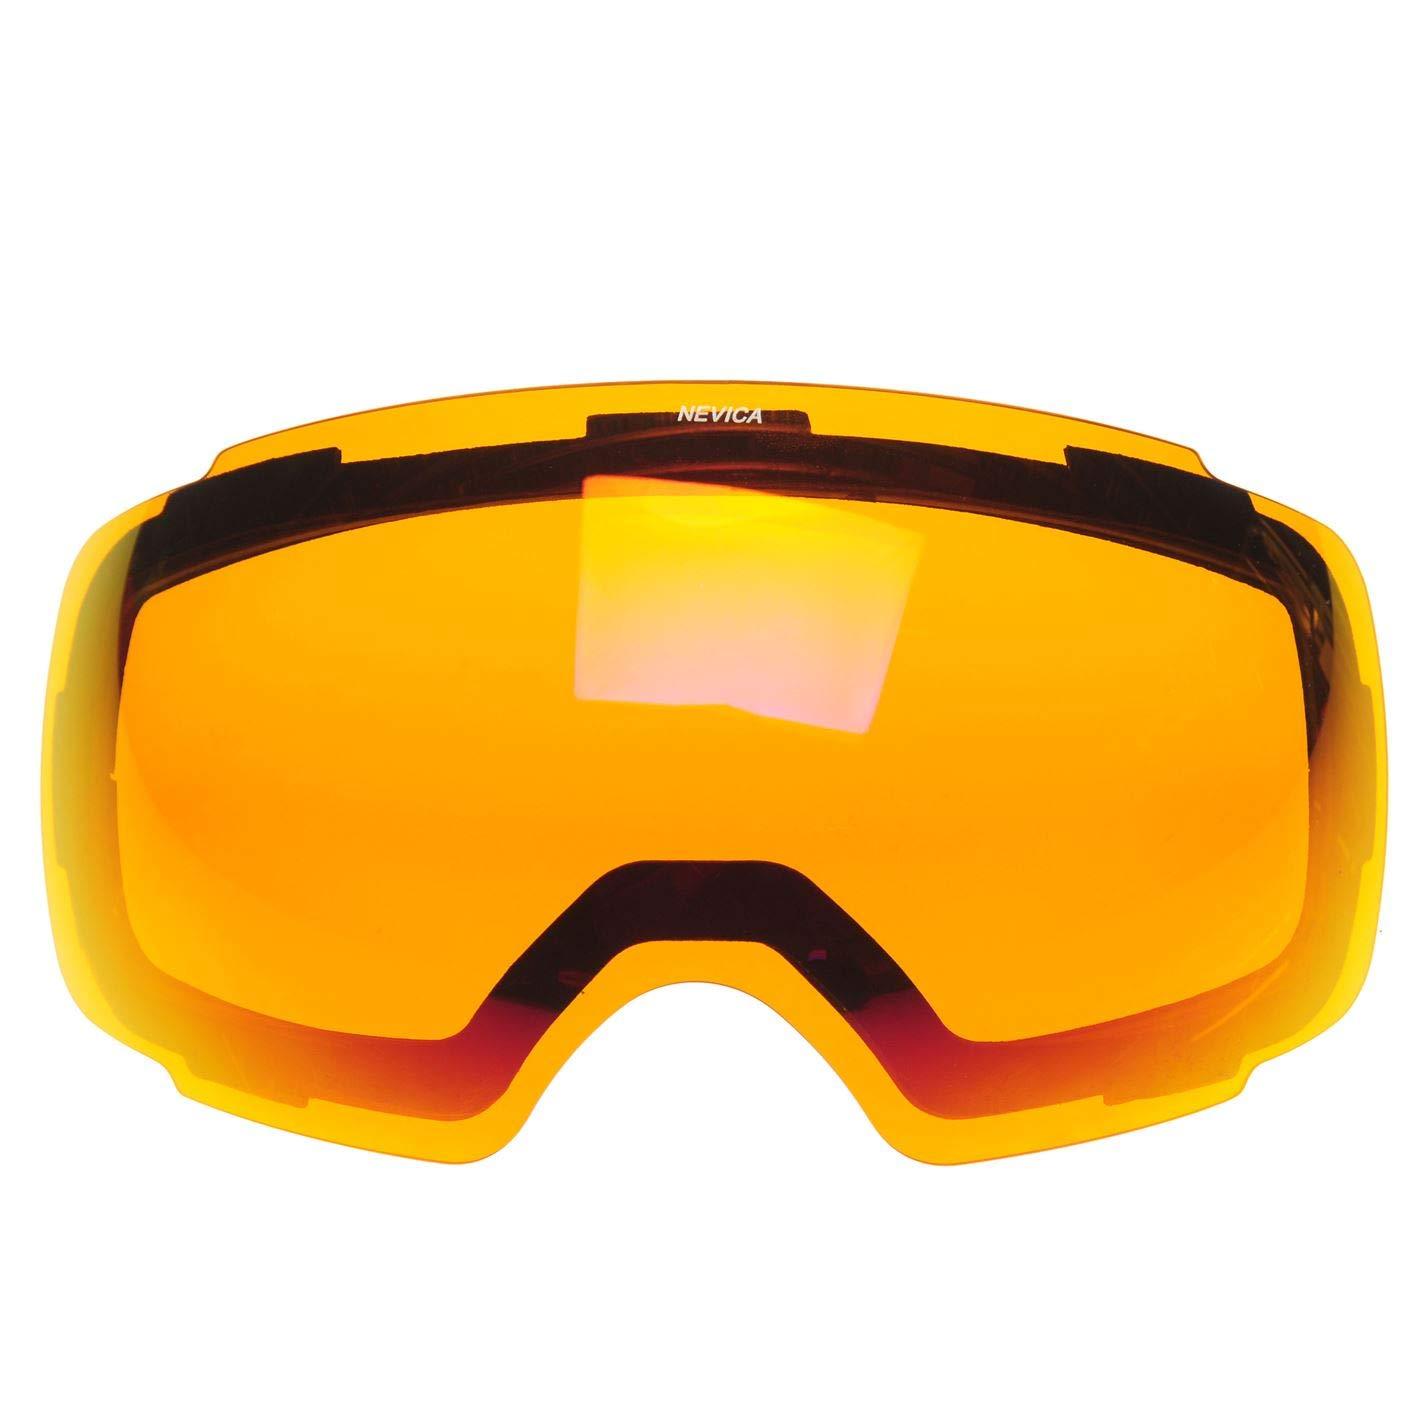 a6c61018f65 Nevica Mens Aspen Magnetic Ski Goggles Black  Amazon.co.uk  Clothing